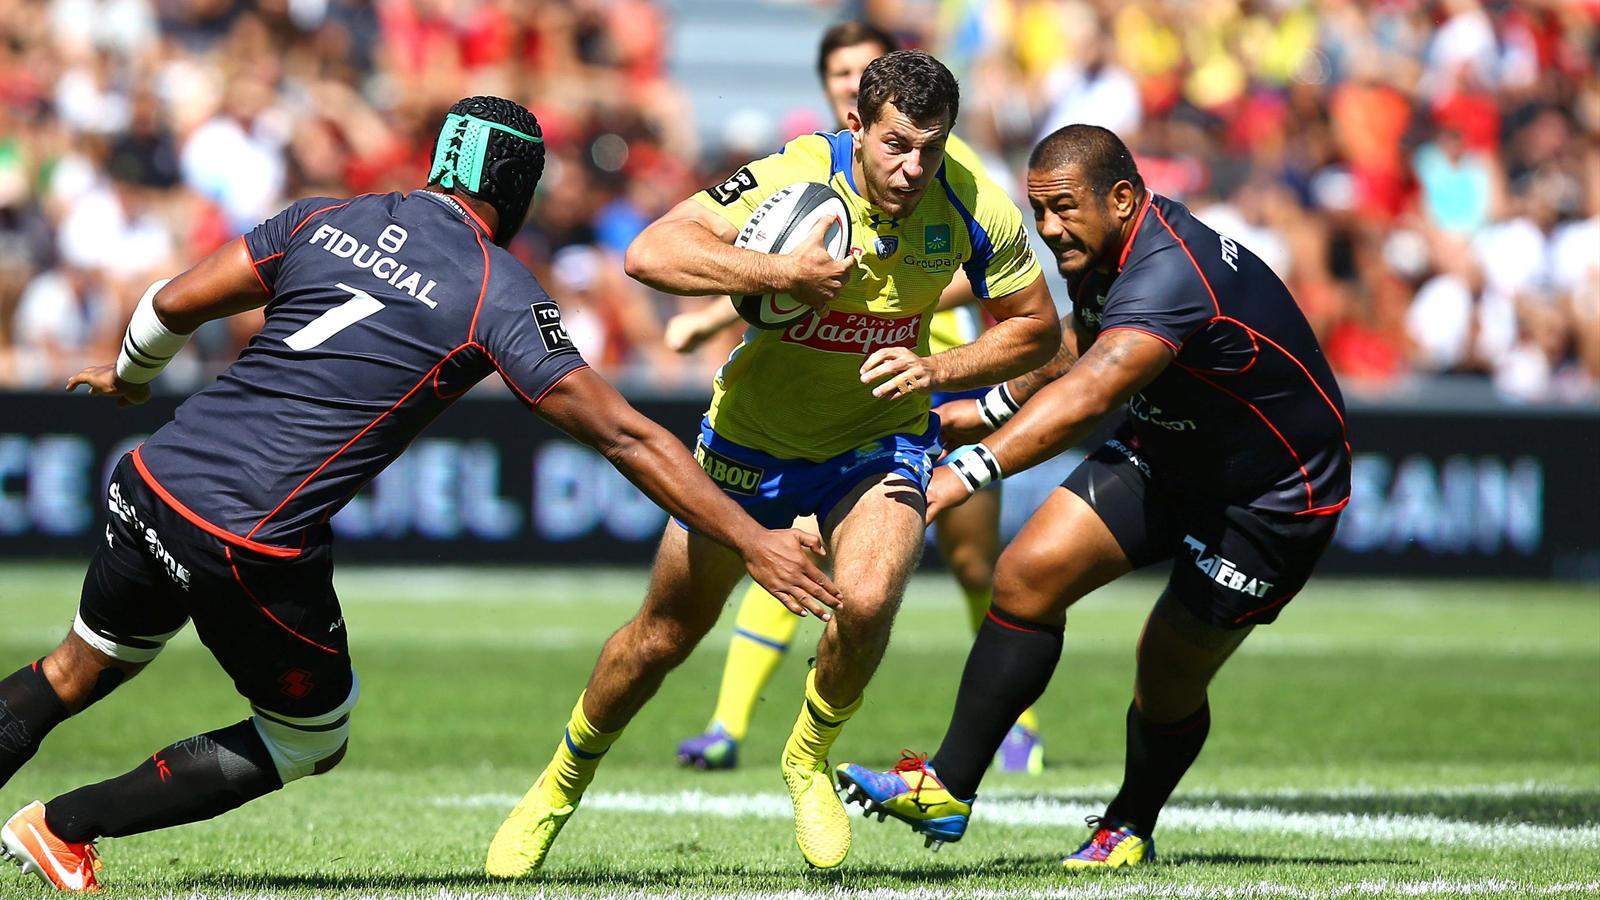 Rugby Top 14: ASM Clermont - Stade Toulousain pour les demi-finales